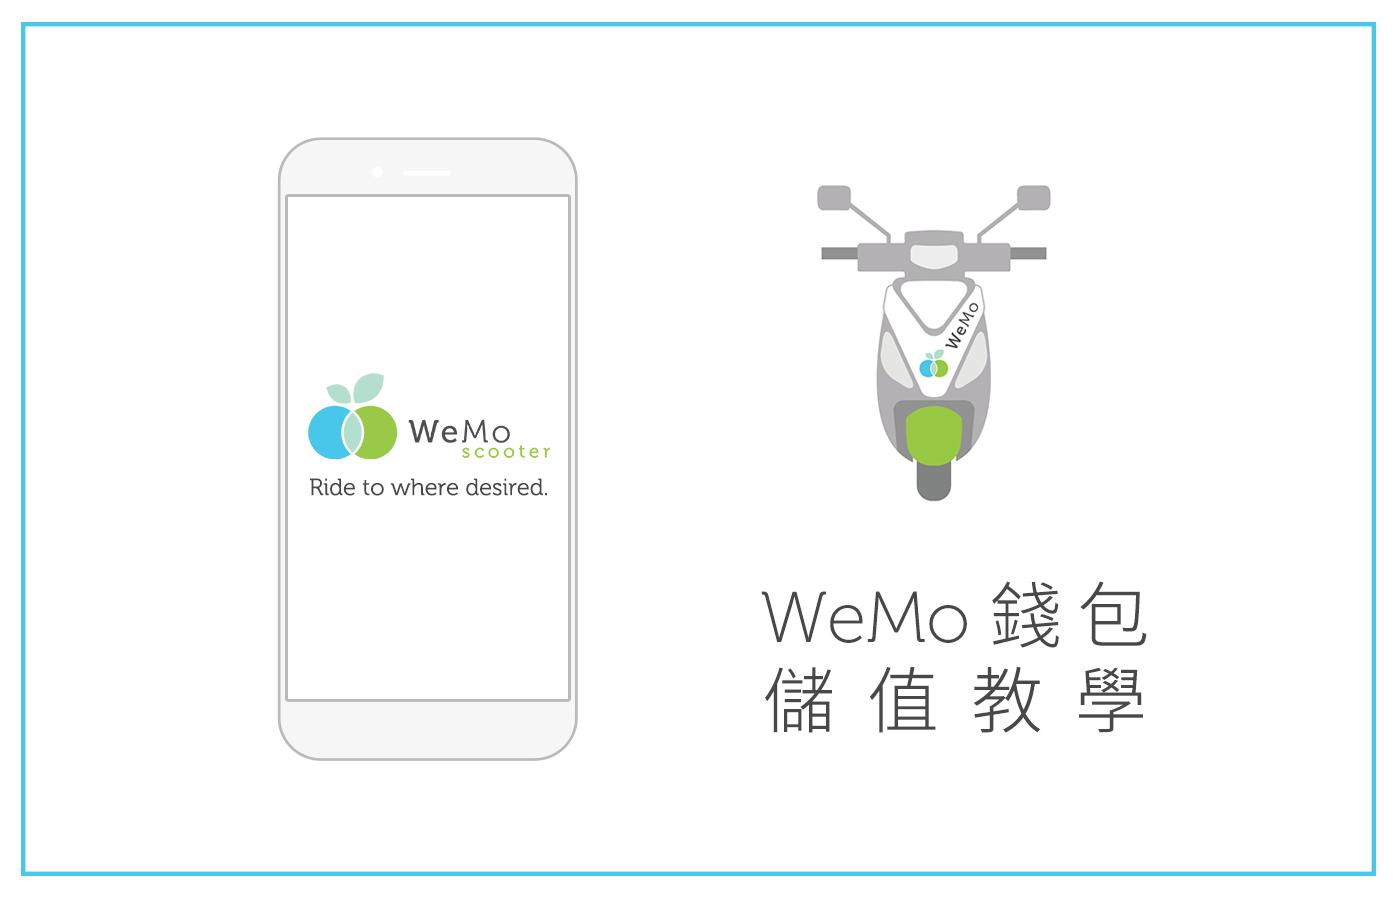 WeMo錢包